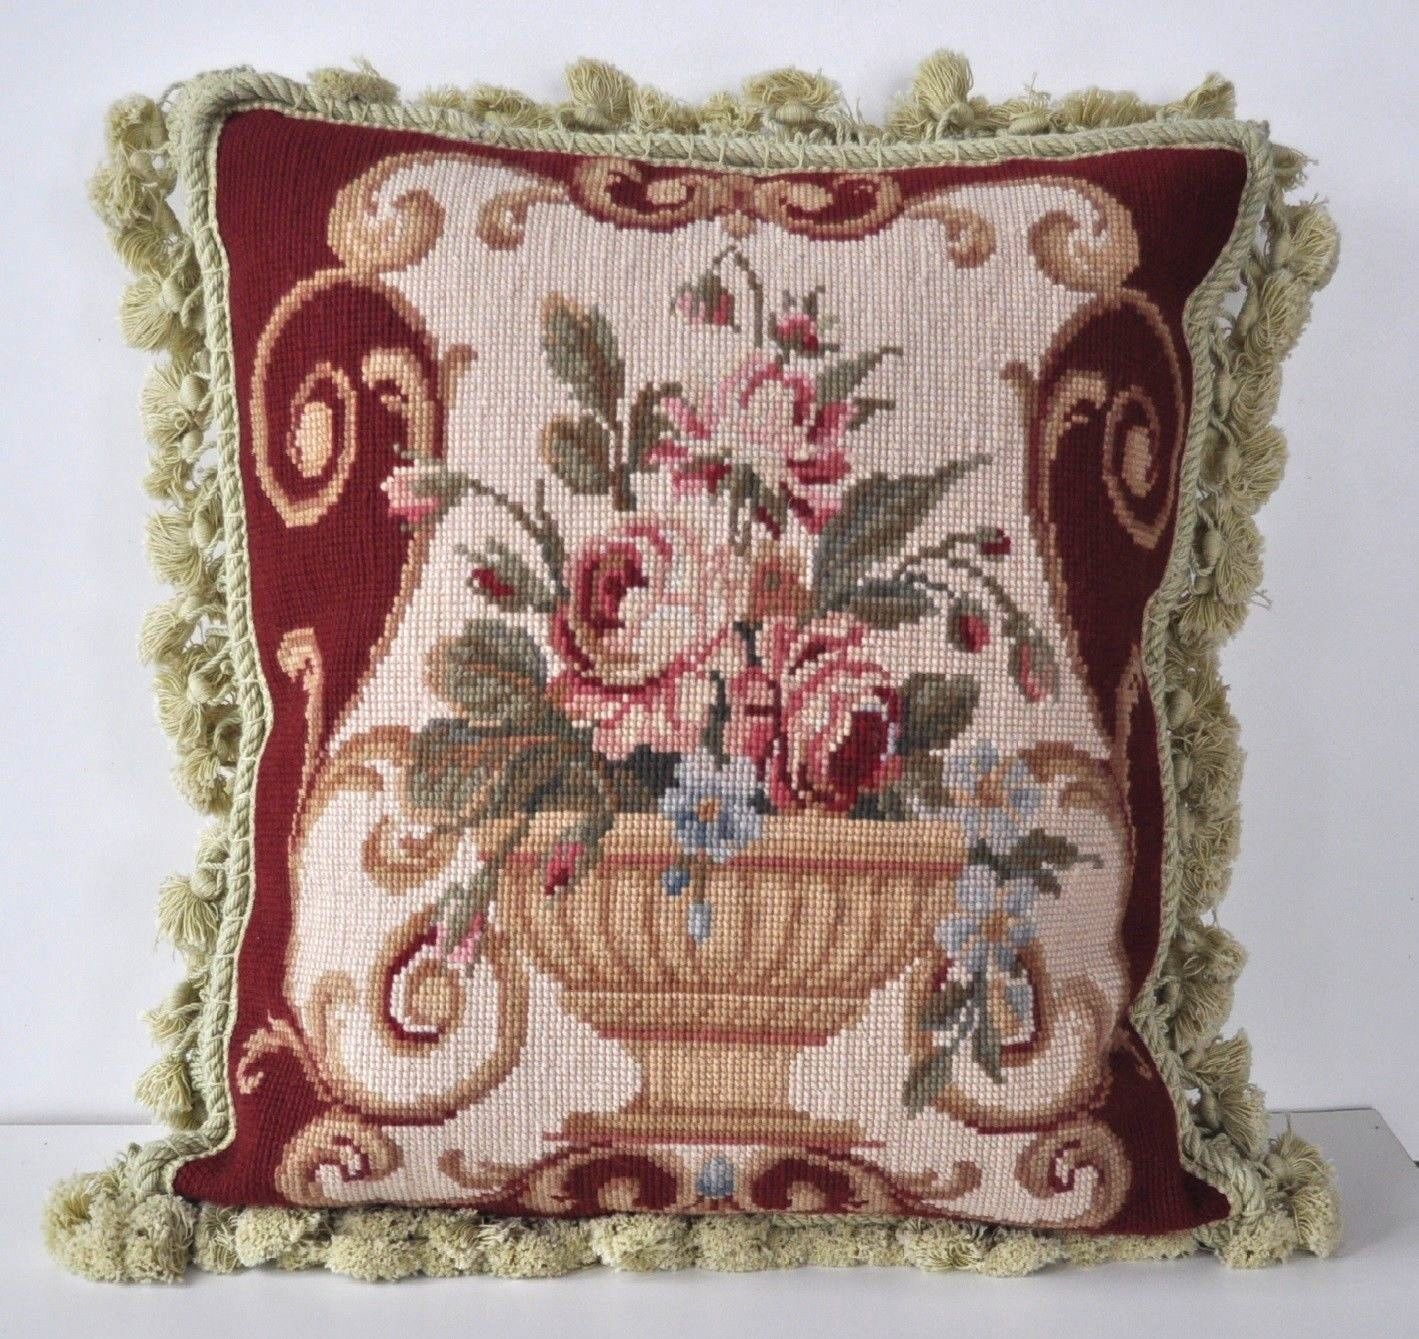 16″ x 16″ Handmade Wool Needlepoint Cushion Cover Pillow Case 12980112